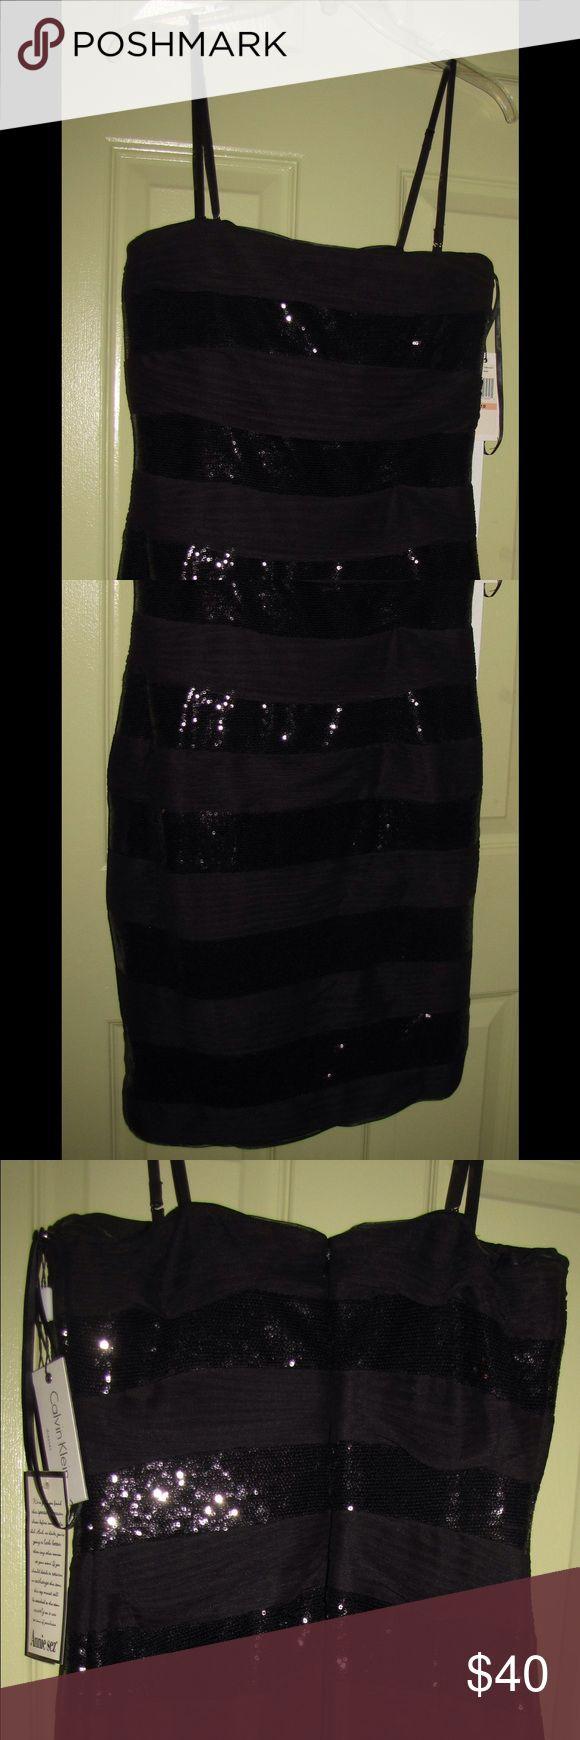 Calvin klein black special occasion dress s 10 nwt calvin klein special occasion dress it s